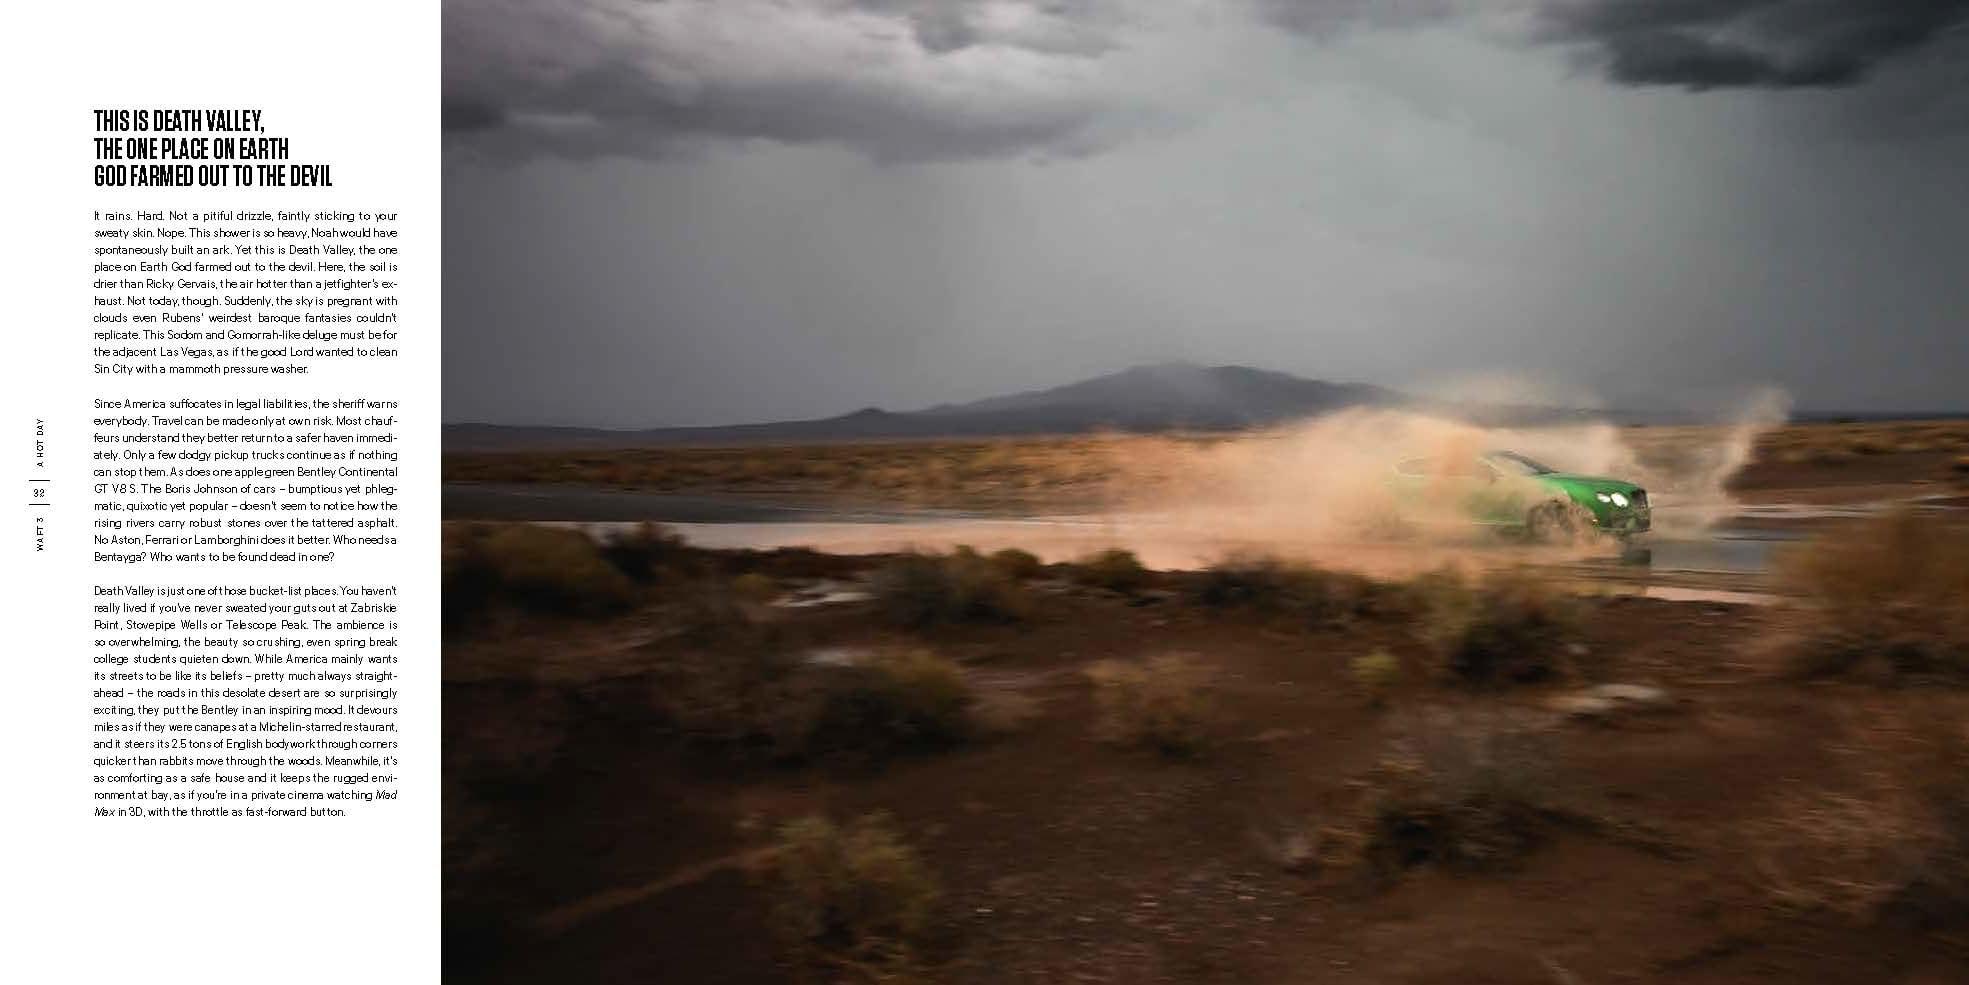 A Bentley splashes its way through some rough Death Valley weather.